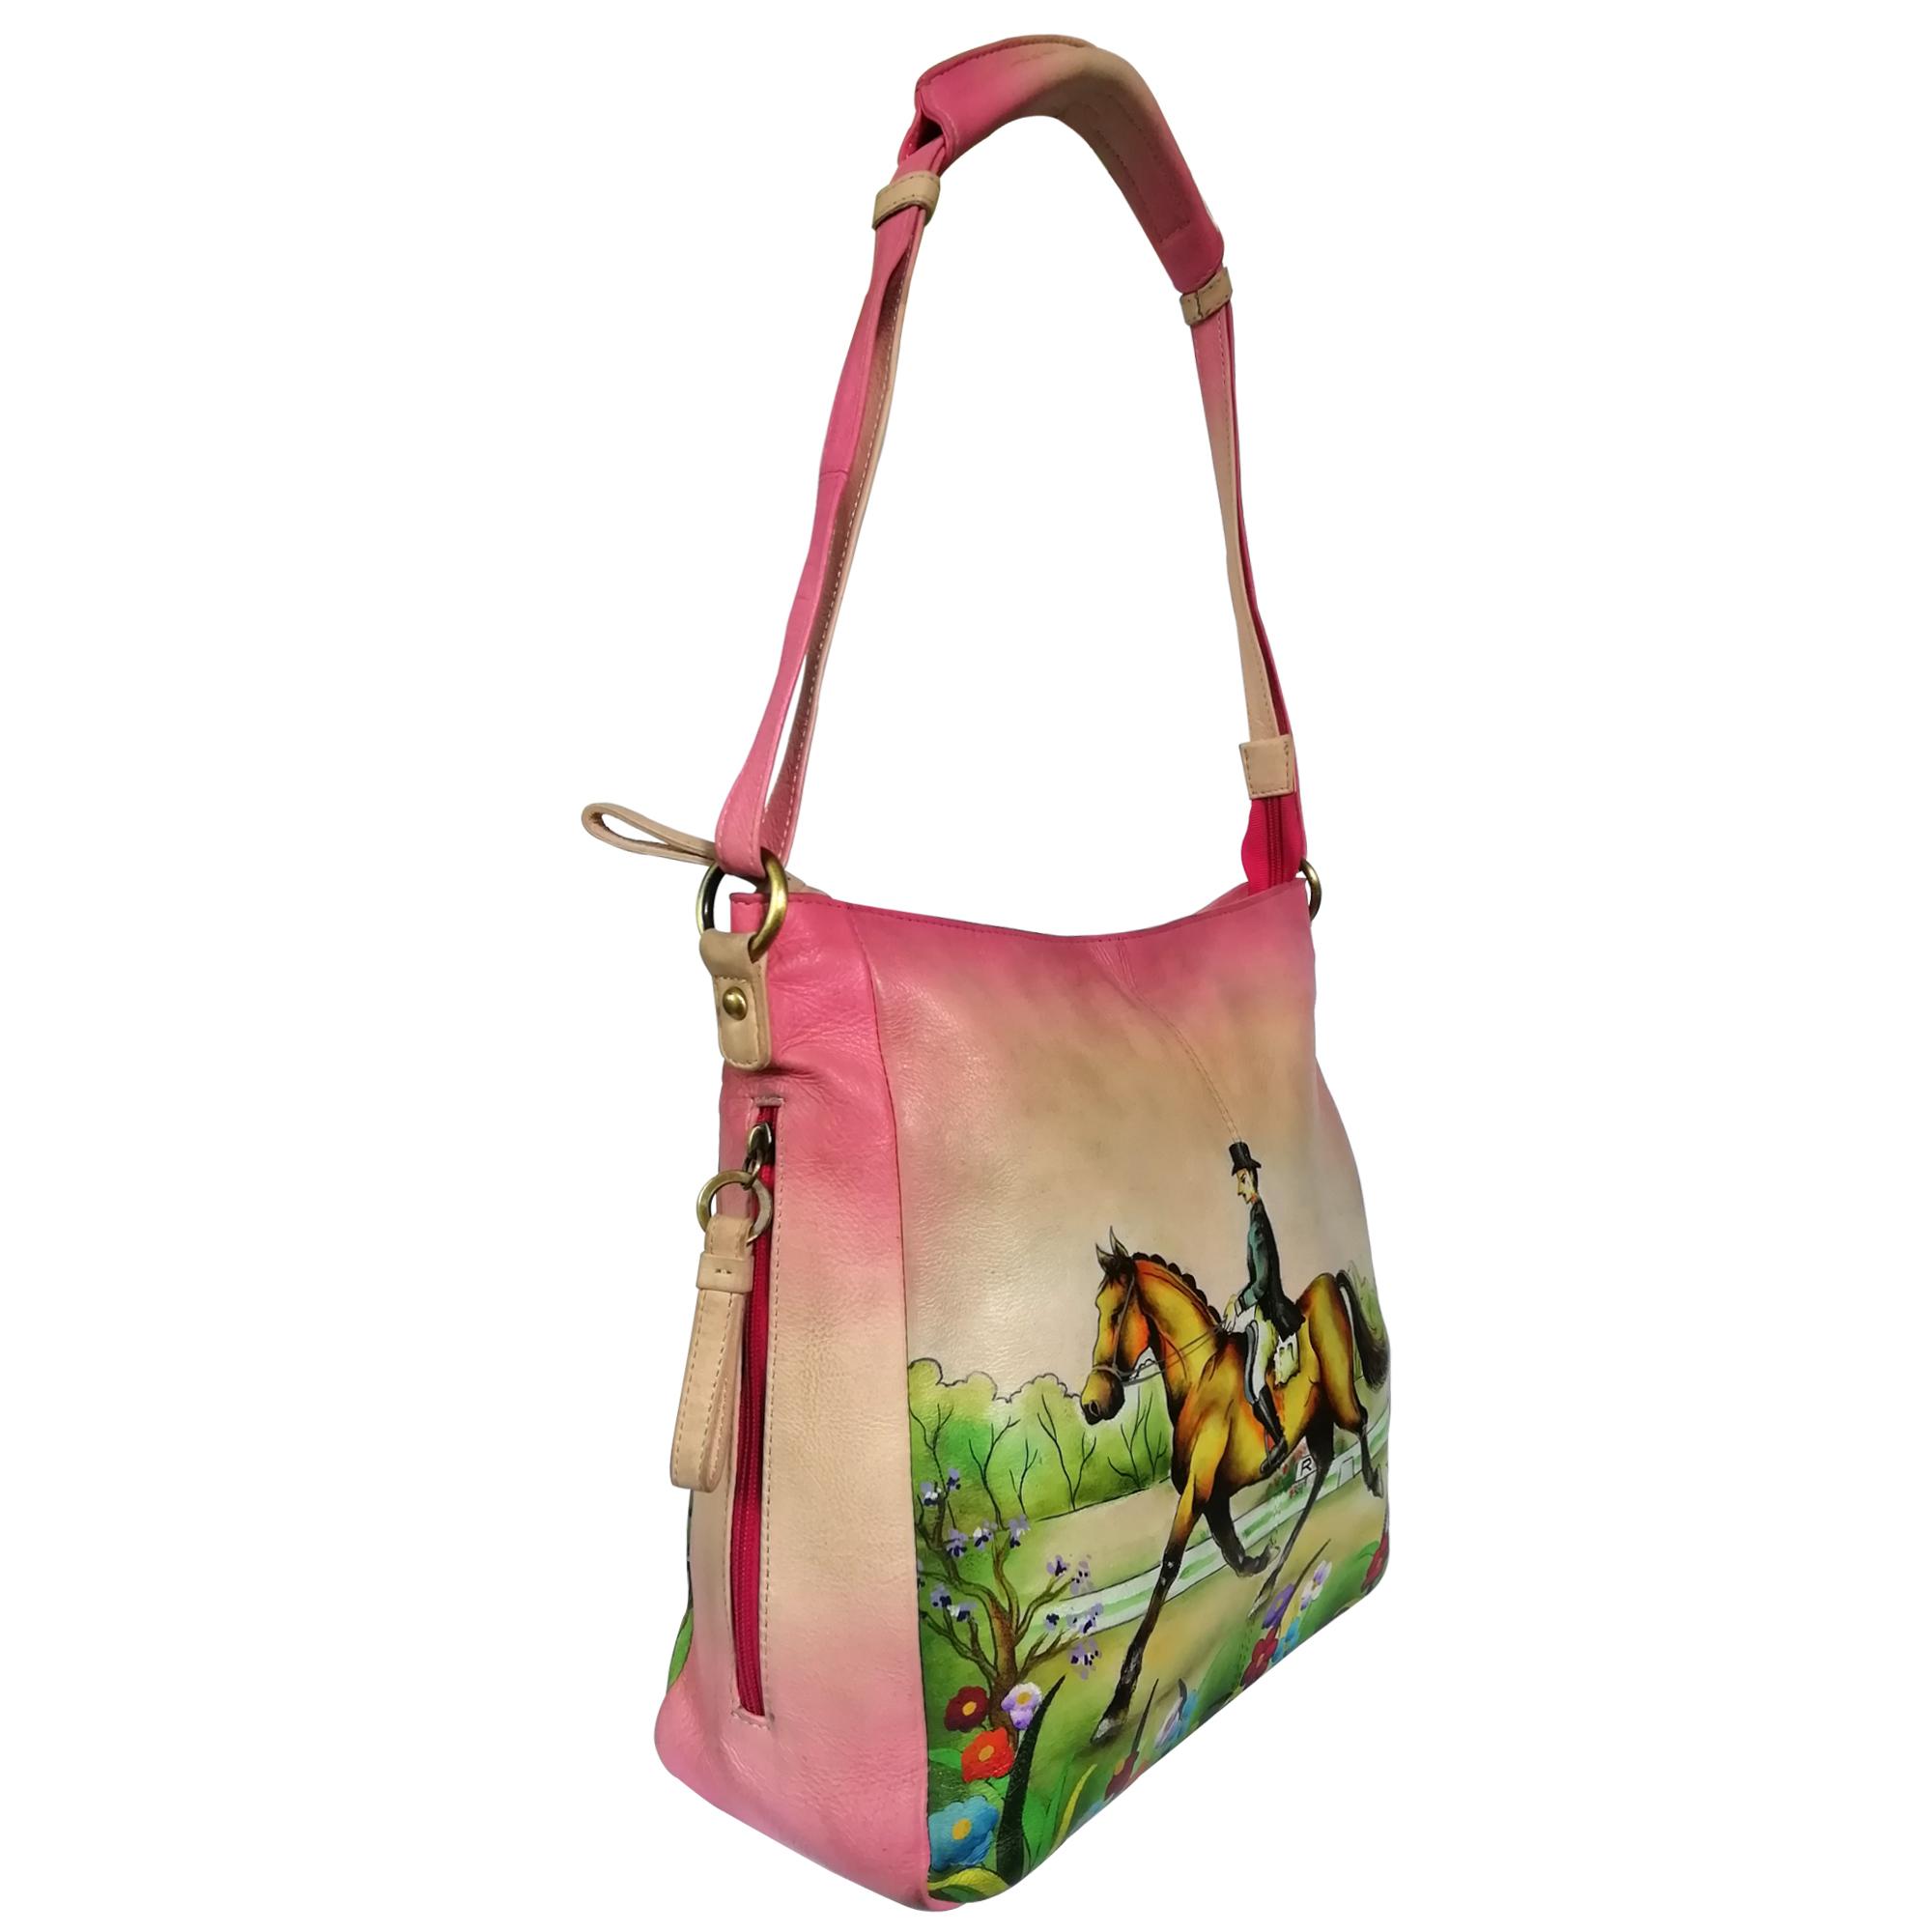 New Hand Painted Leather Shoulder Bag Horse Design